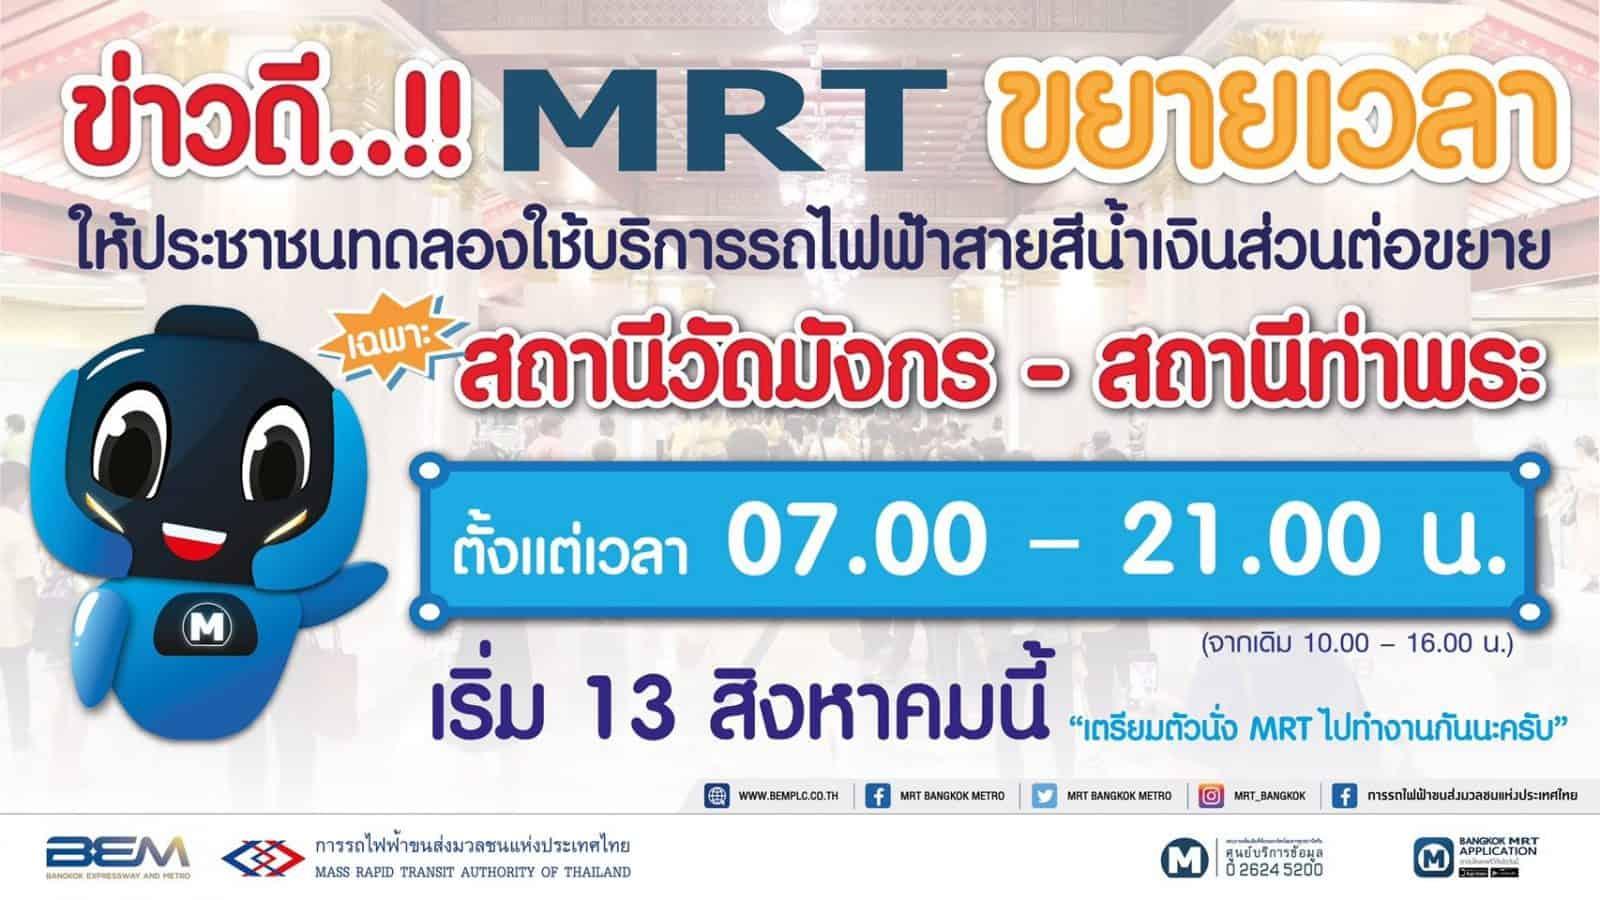 MRT สายสีน้ำเงิน (ส่วนต่อขยาย) ใจดีขยายเวลาเปิดทดลอง 07.00 - 21.00 น. เริ่ม 13 สิงหา 62